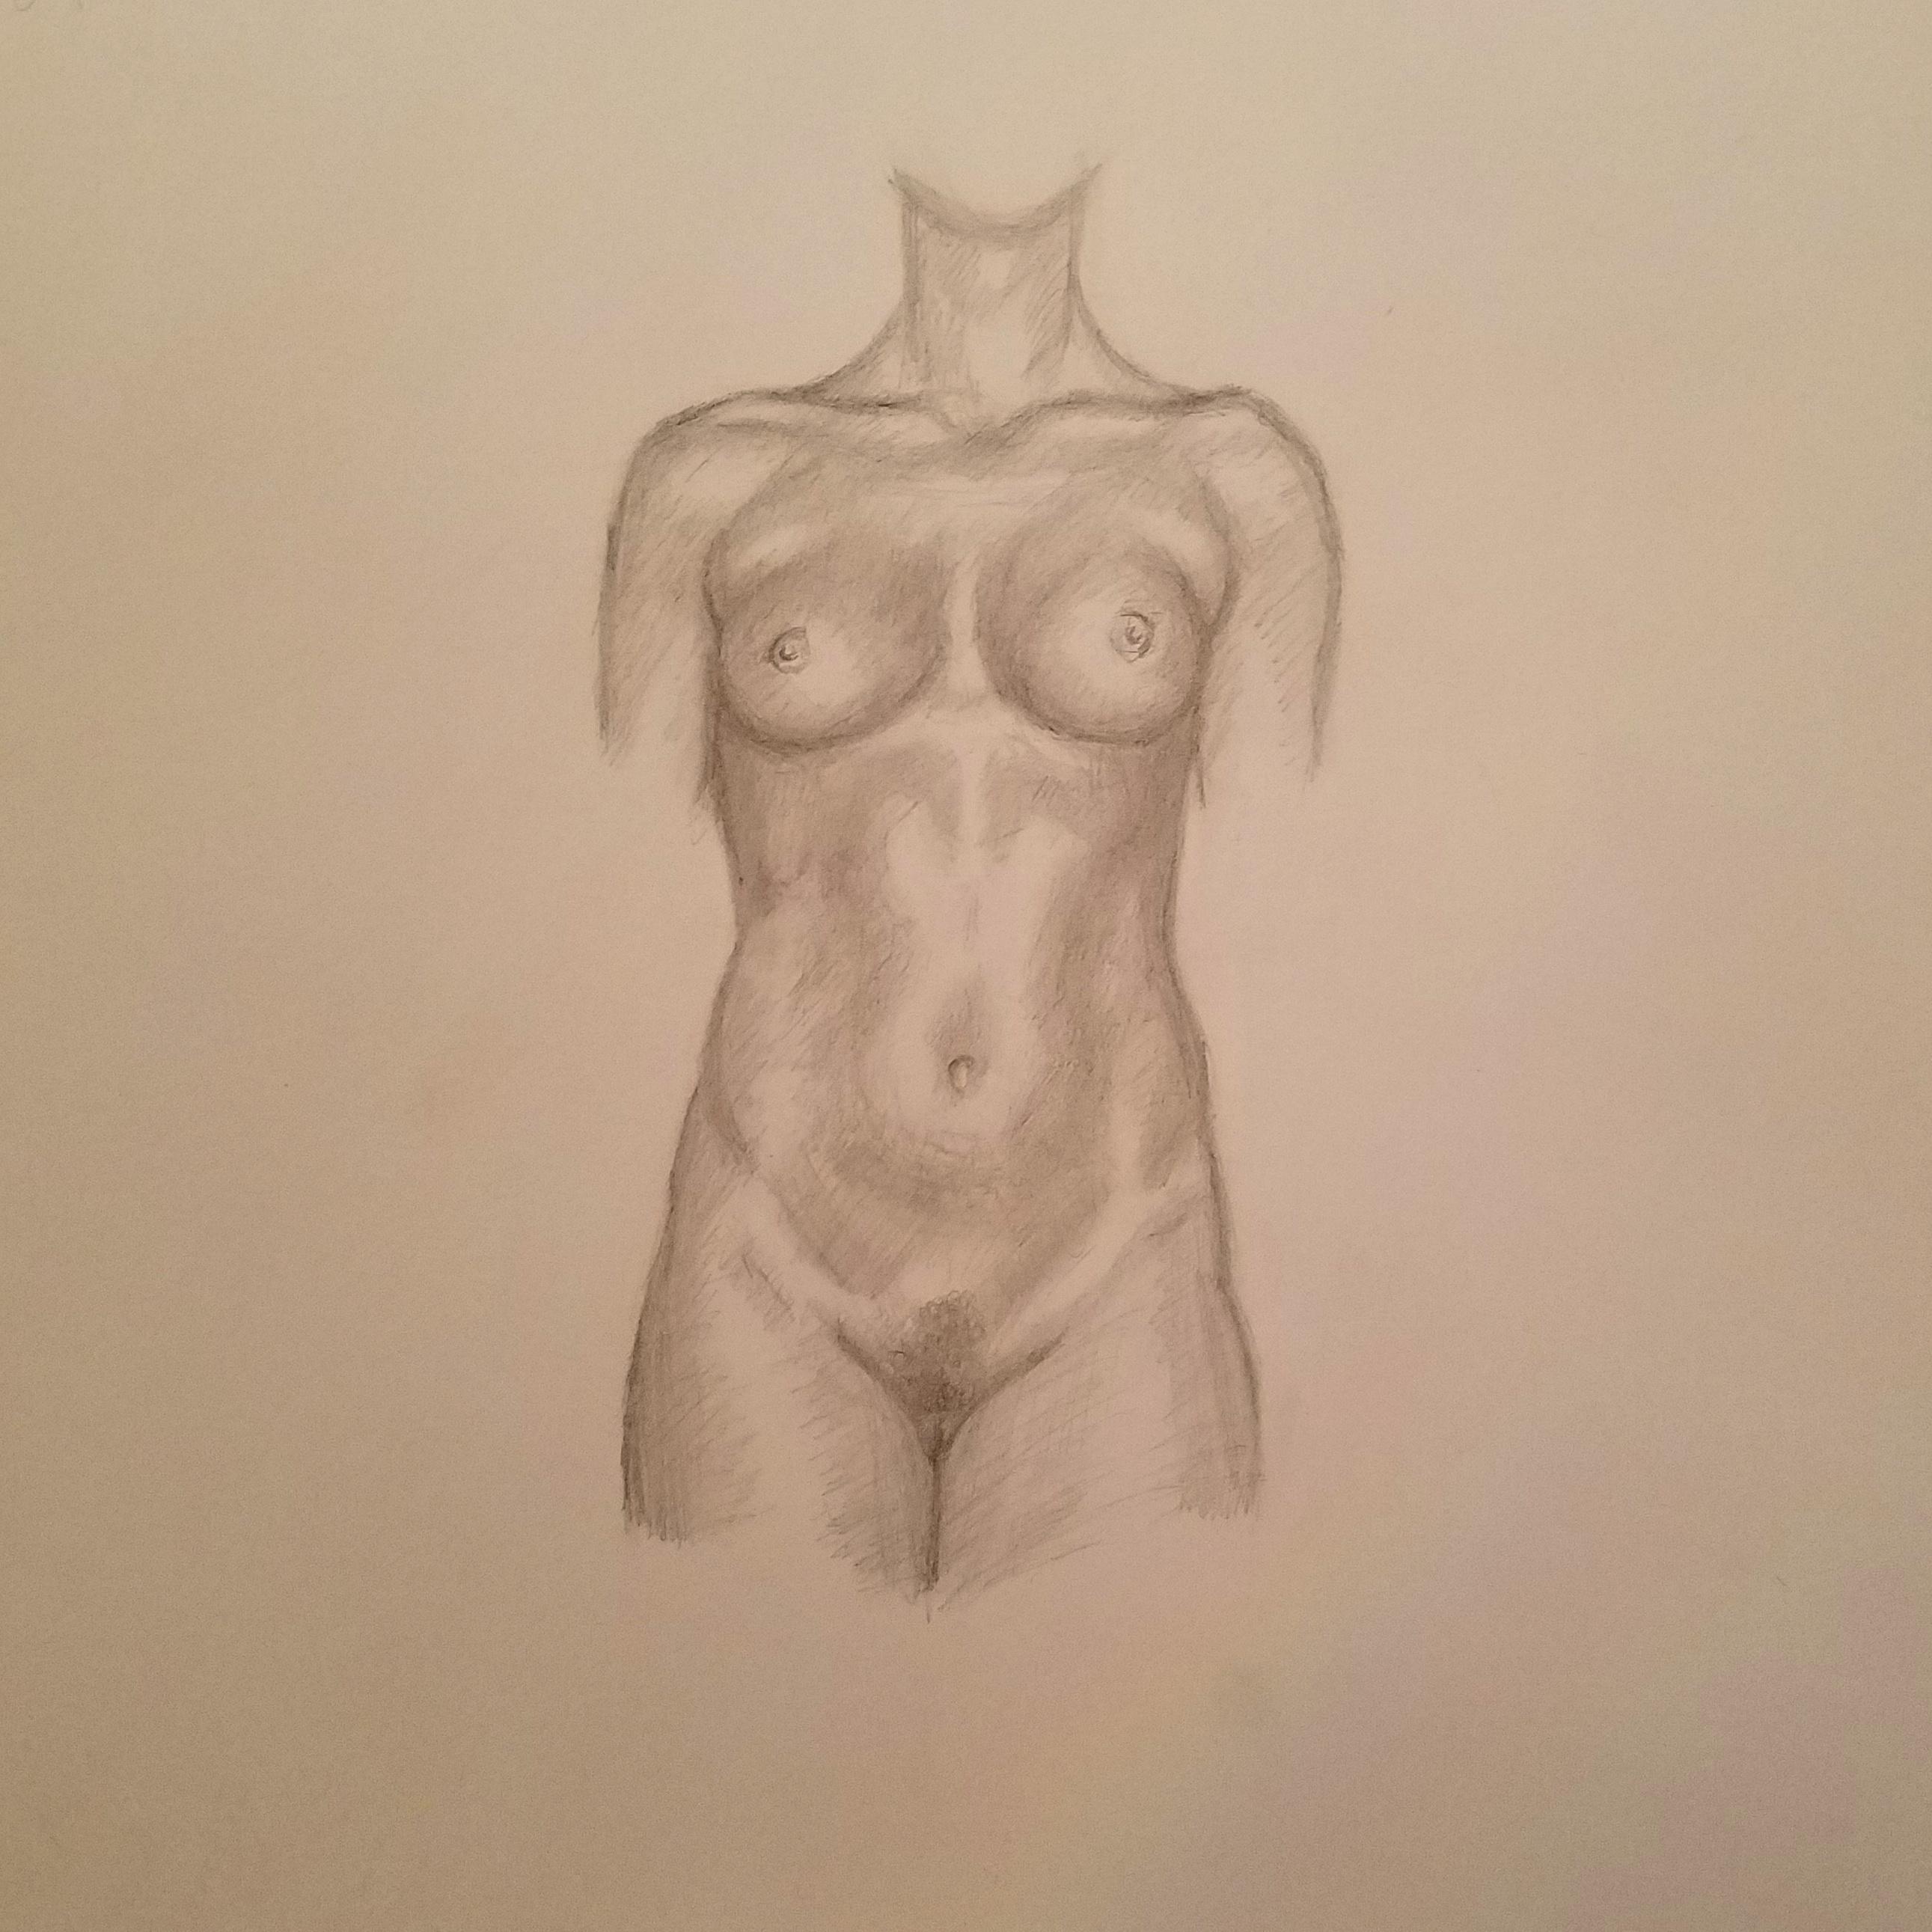 Female Anatomy Practise